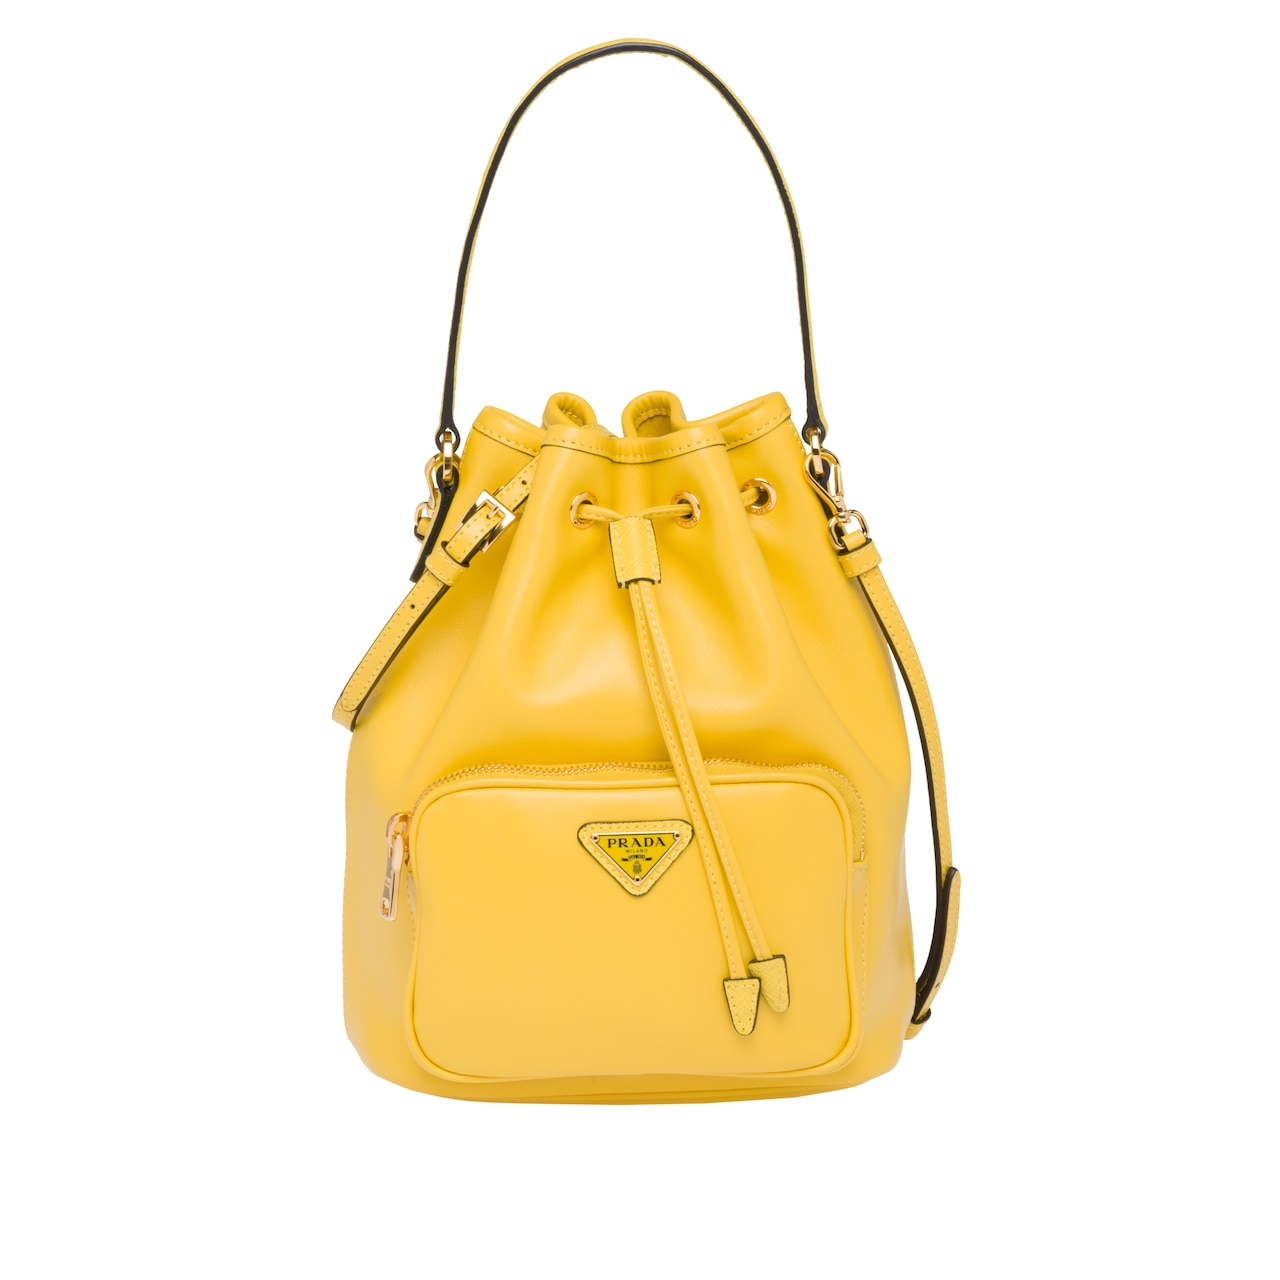 2c5a3201b2e85f Leather bucket bag | Prada - 1BH038_2CCC_F0377_V_OOM